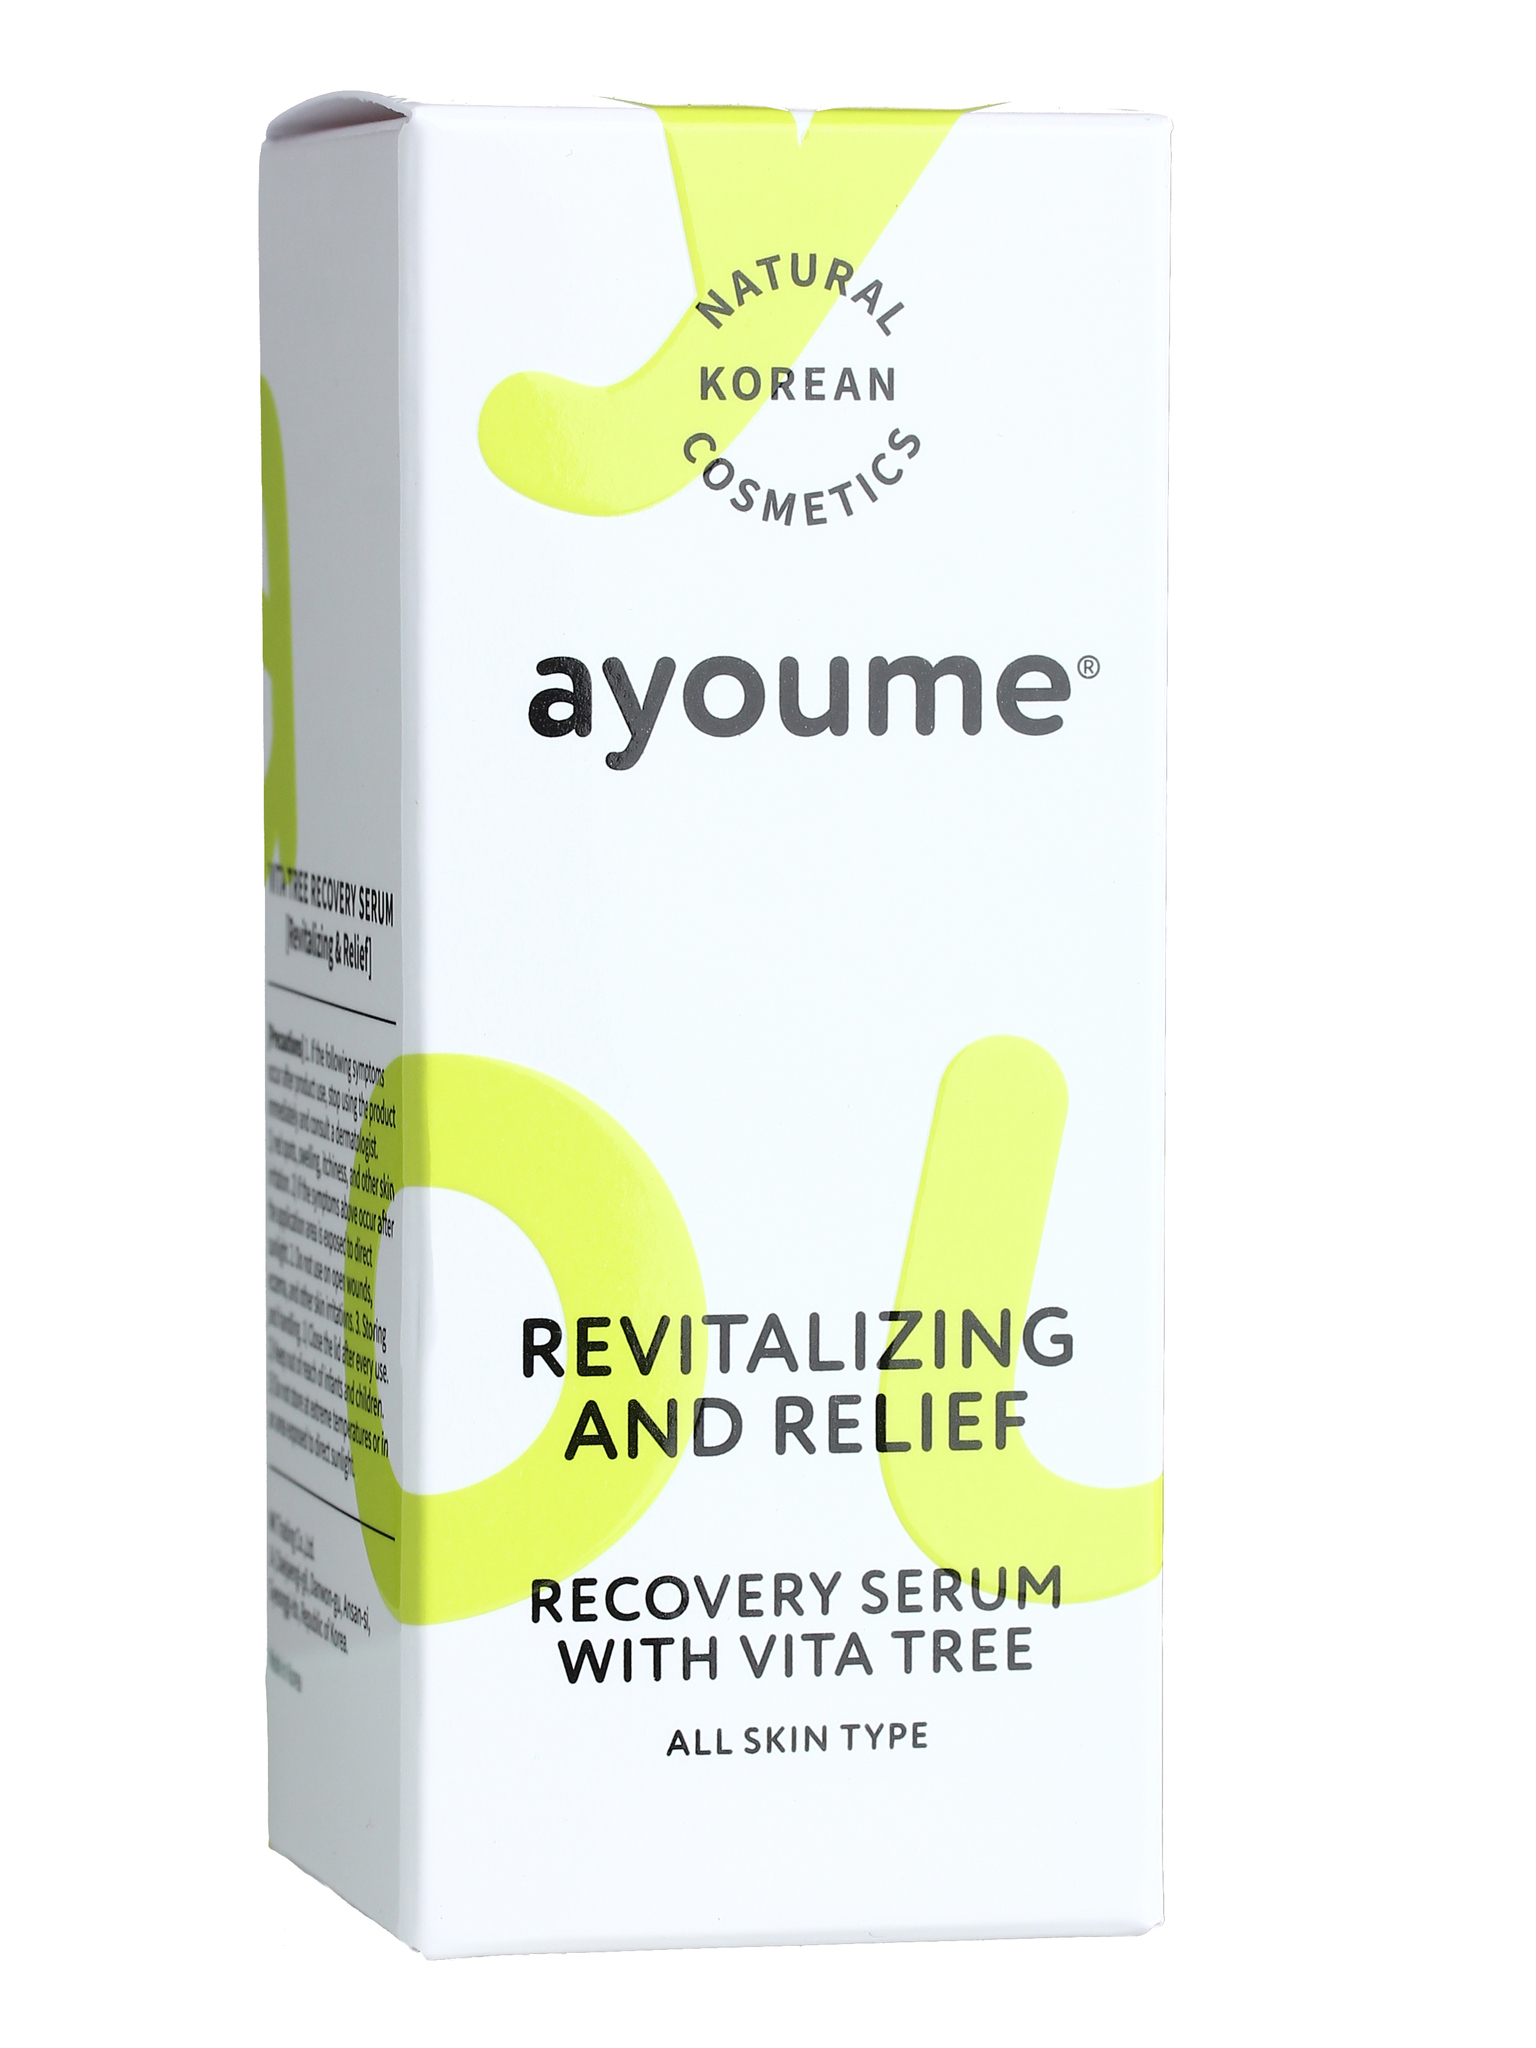 Каталог Сыворотка для лица восстанавливающая AYOUME Vita Tree Revitalizing-&-Relief serum IMG_8022_mi_white_background.jpg